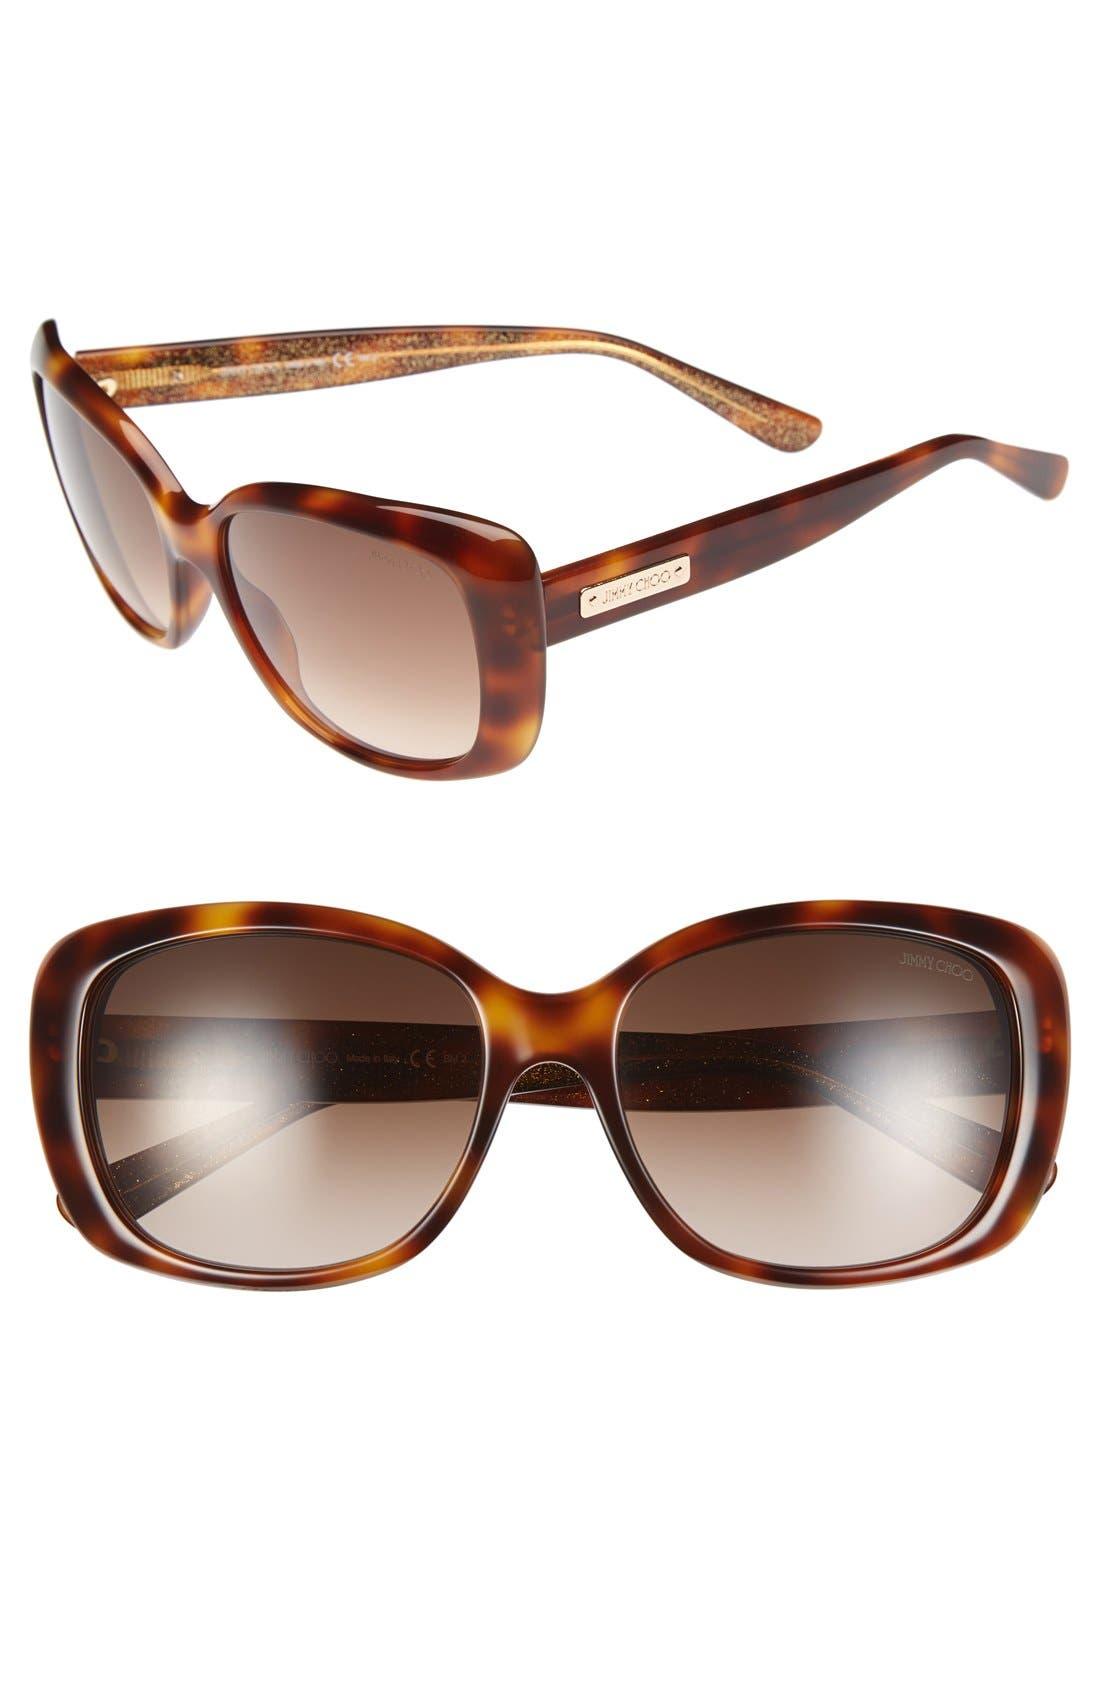 56mm Sunglasses,                             Main thumbnail 1, color,                             HAVANA